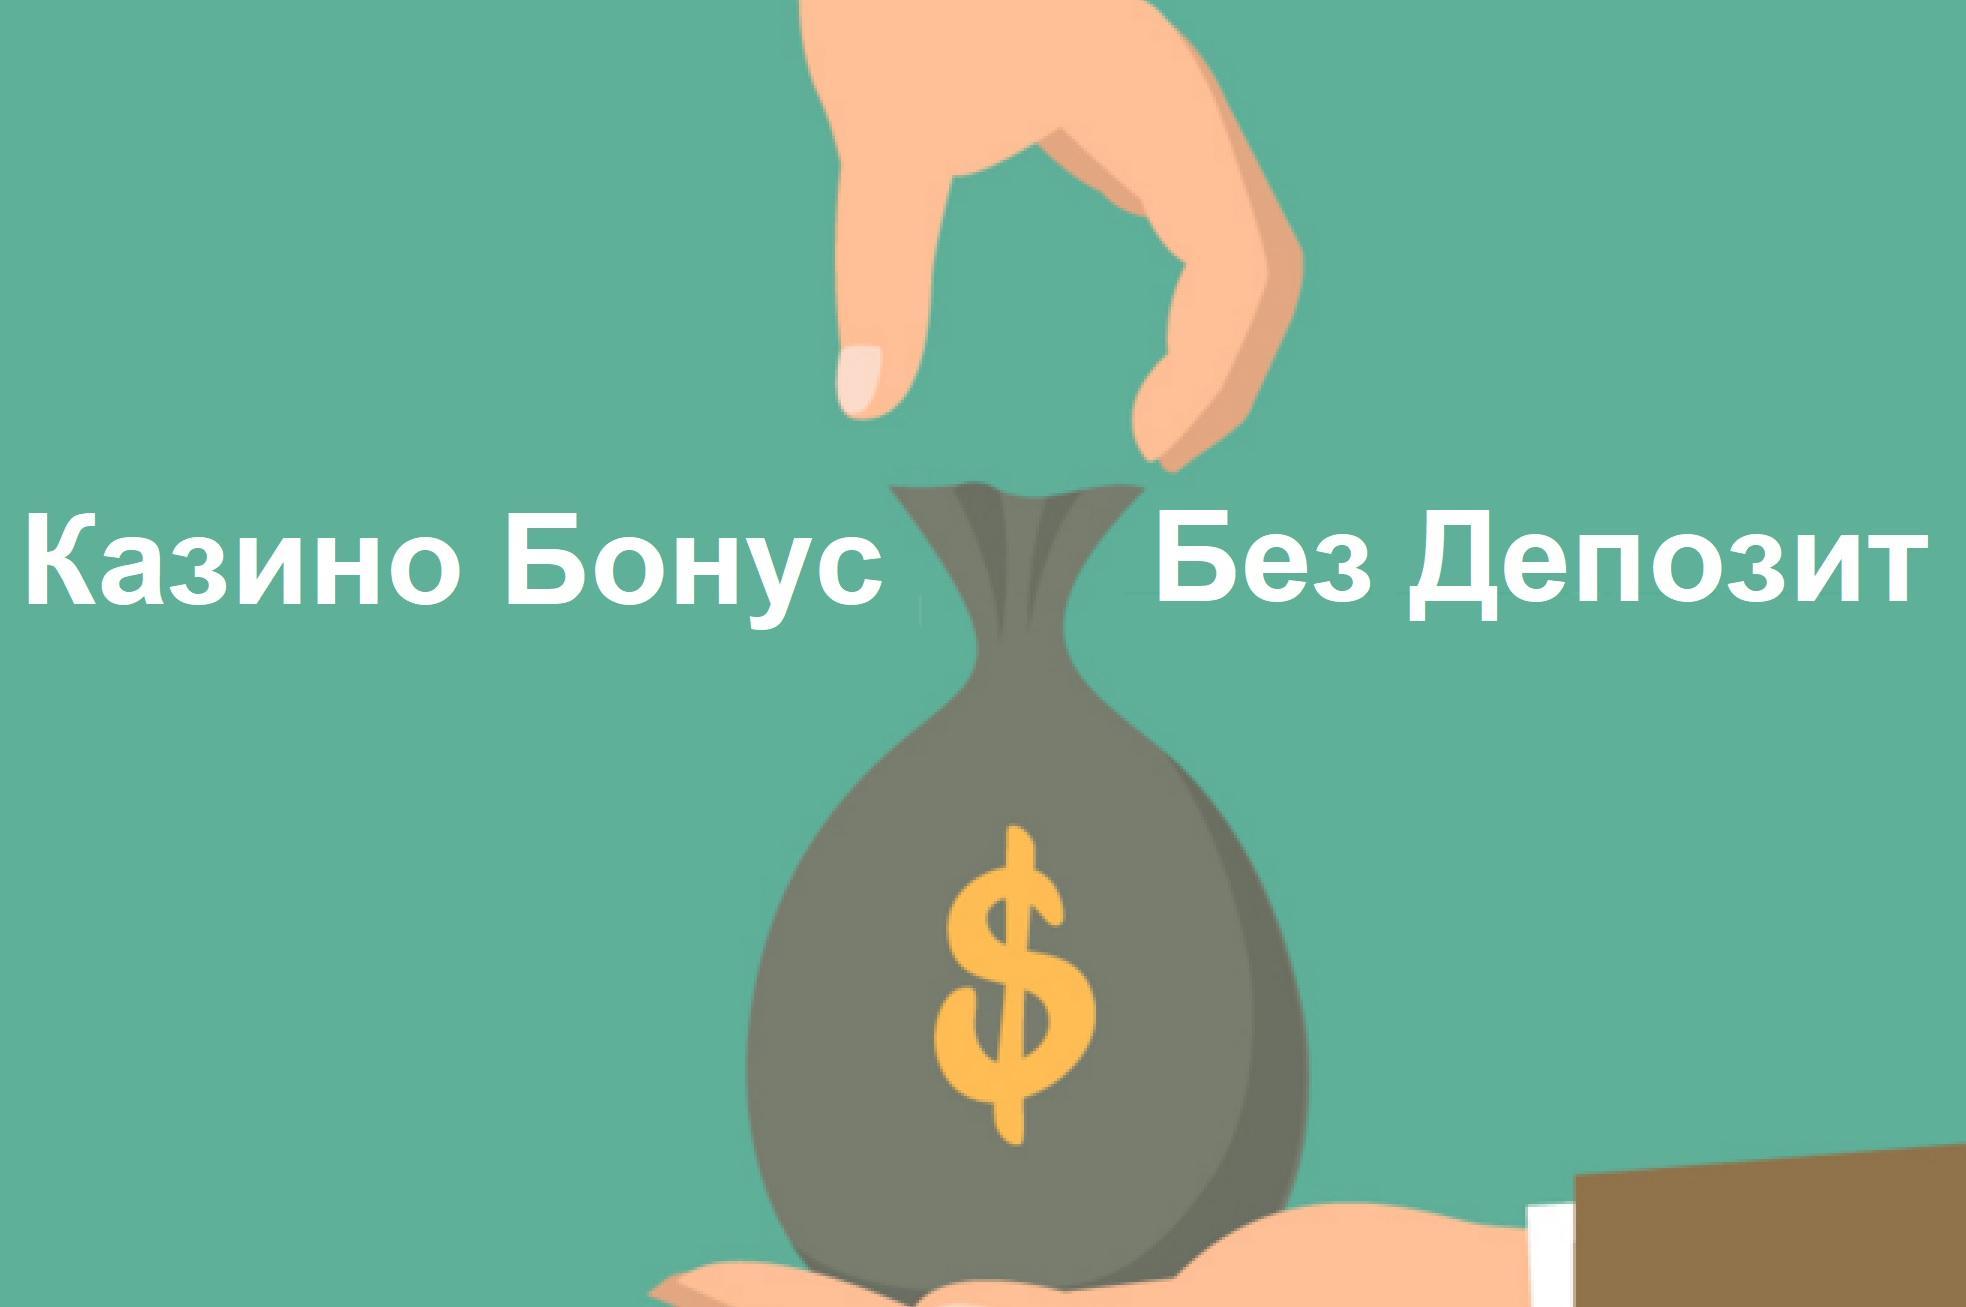 Казино бонус без депозит